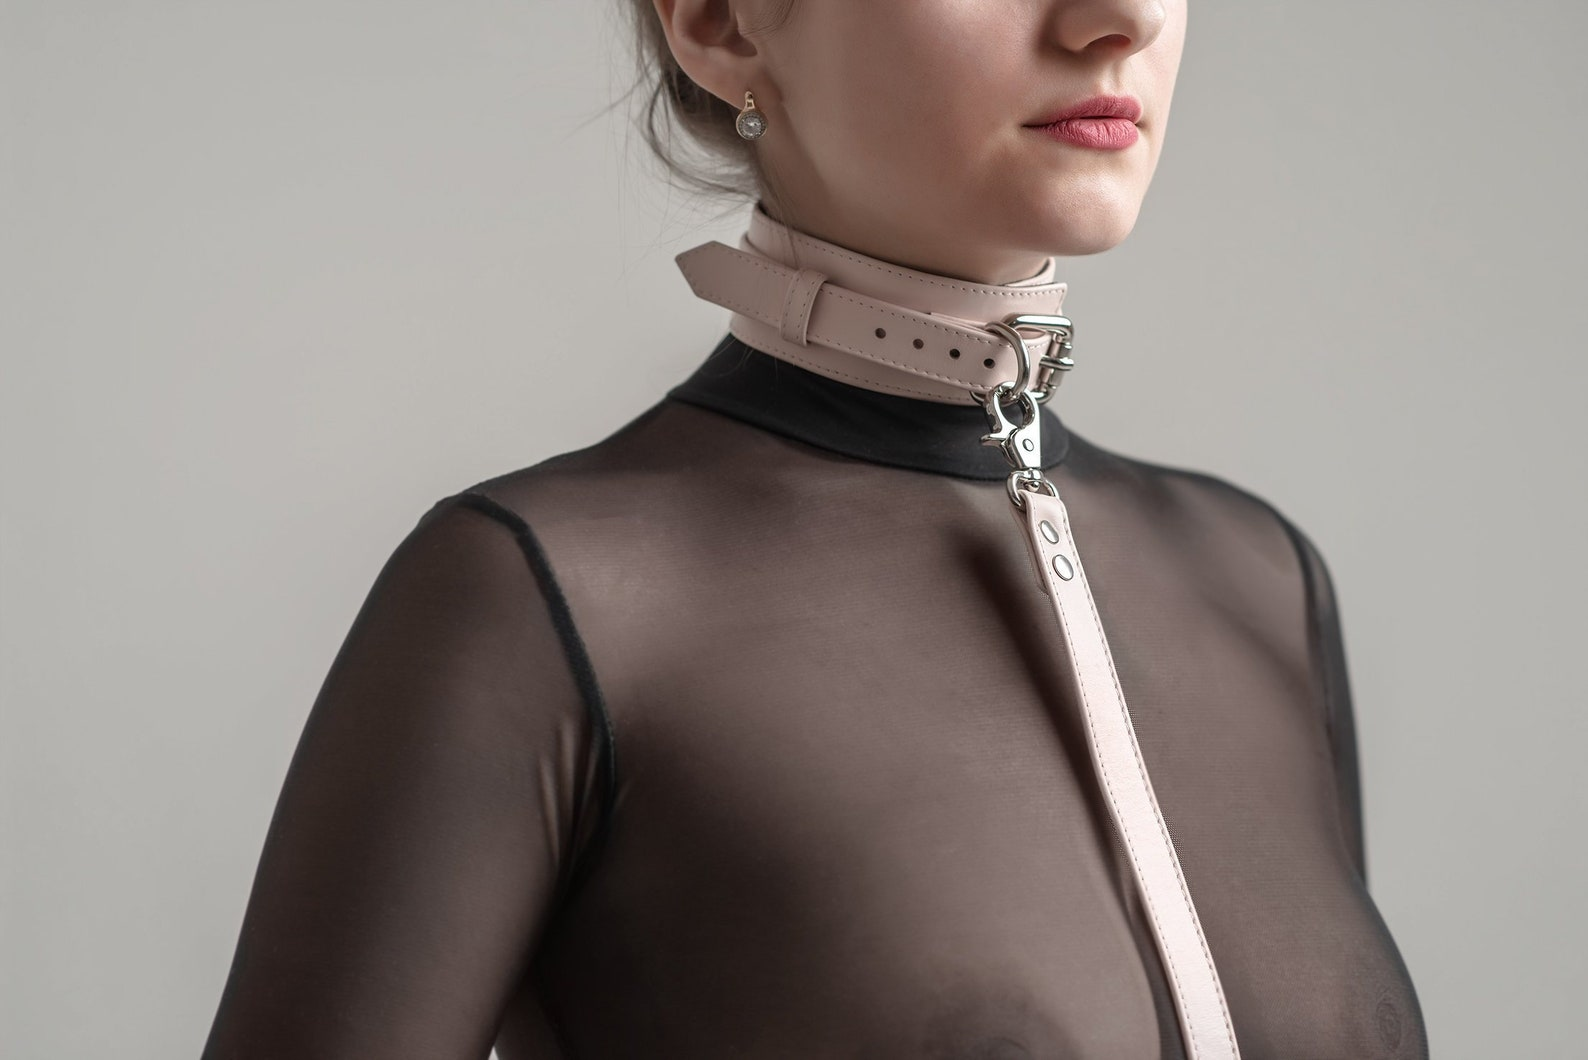 Black Leather Bdsm Collar D Ring Bondage Collar Mature Slave